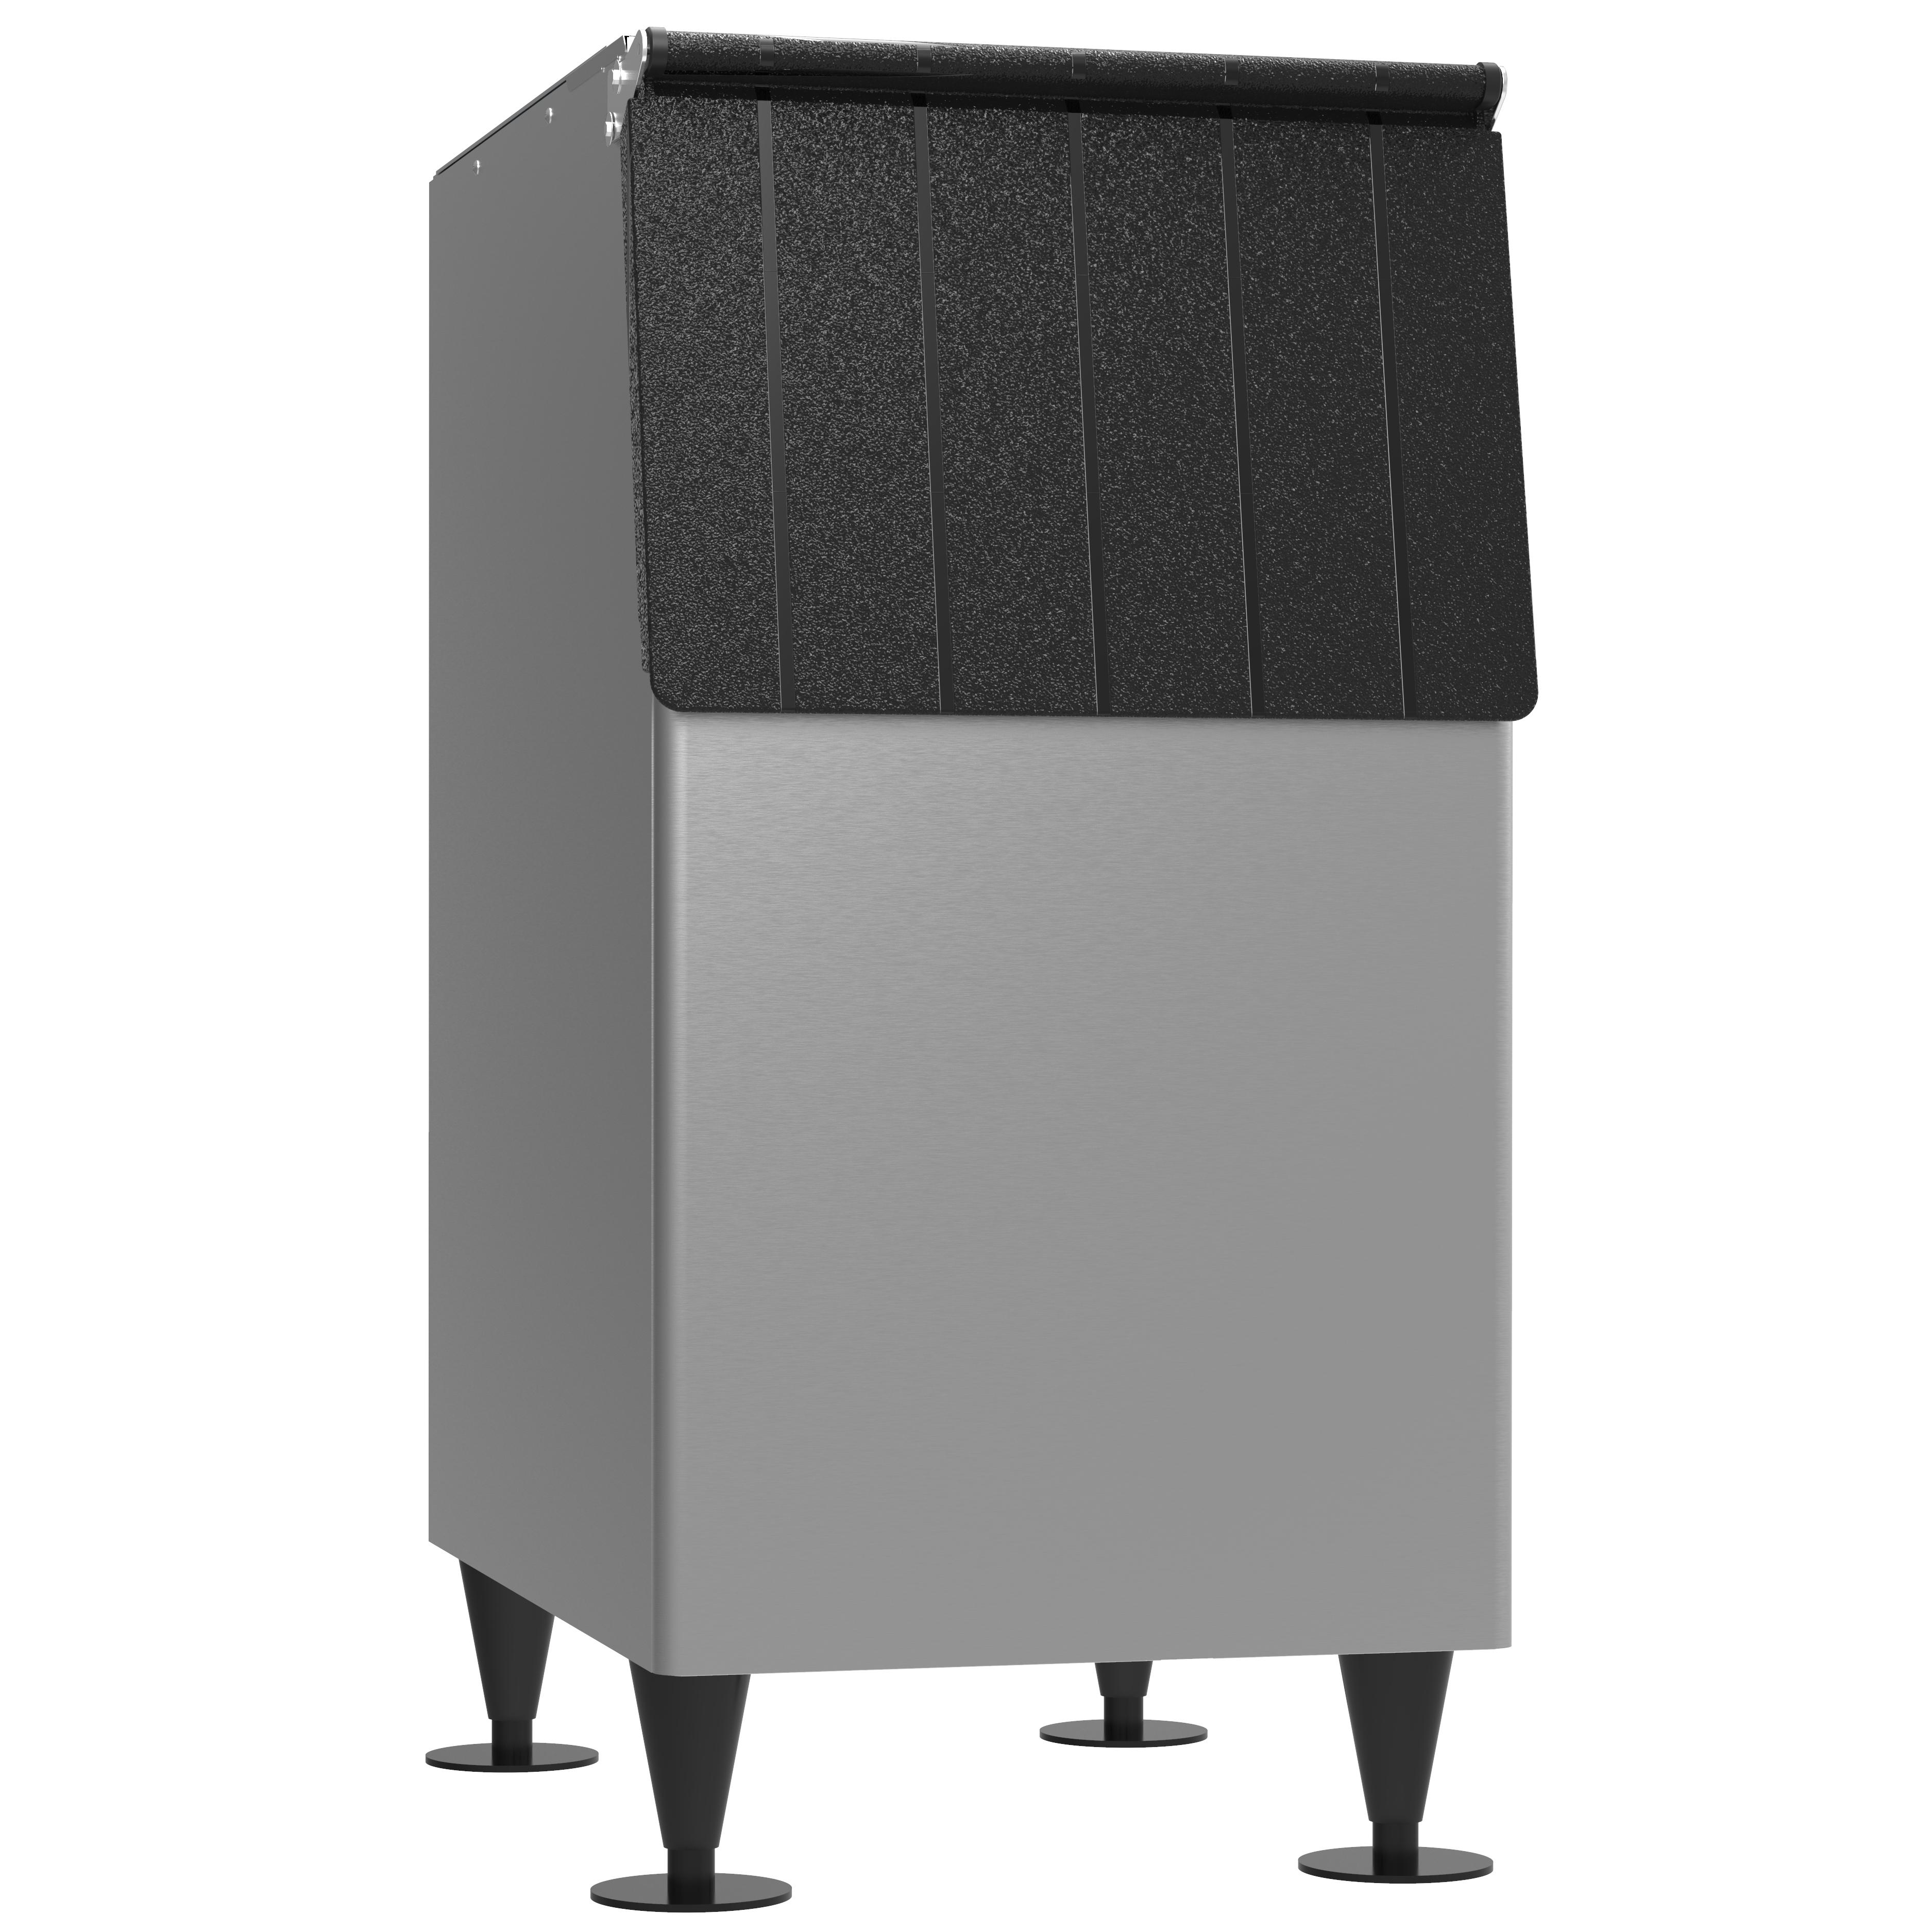 Hoshizaki B-300PF ice cubers, ice storage & ice dispensers